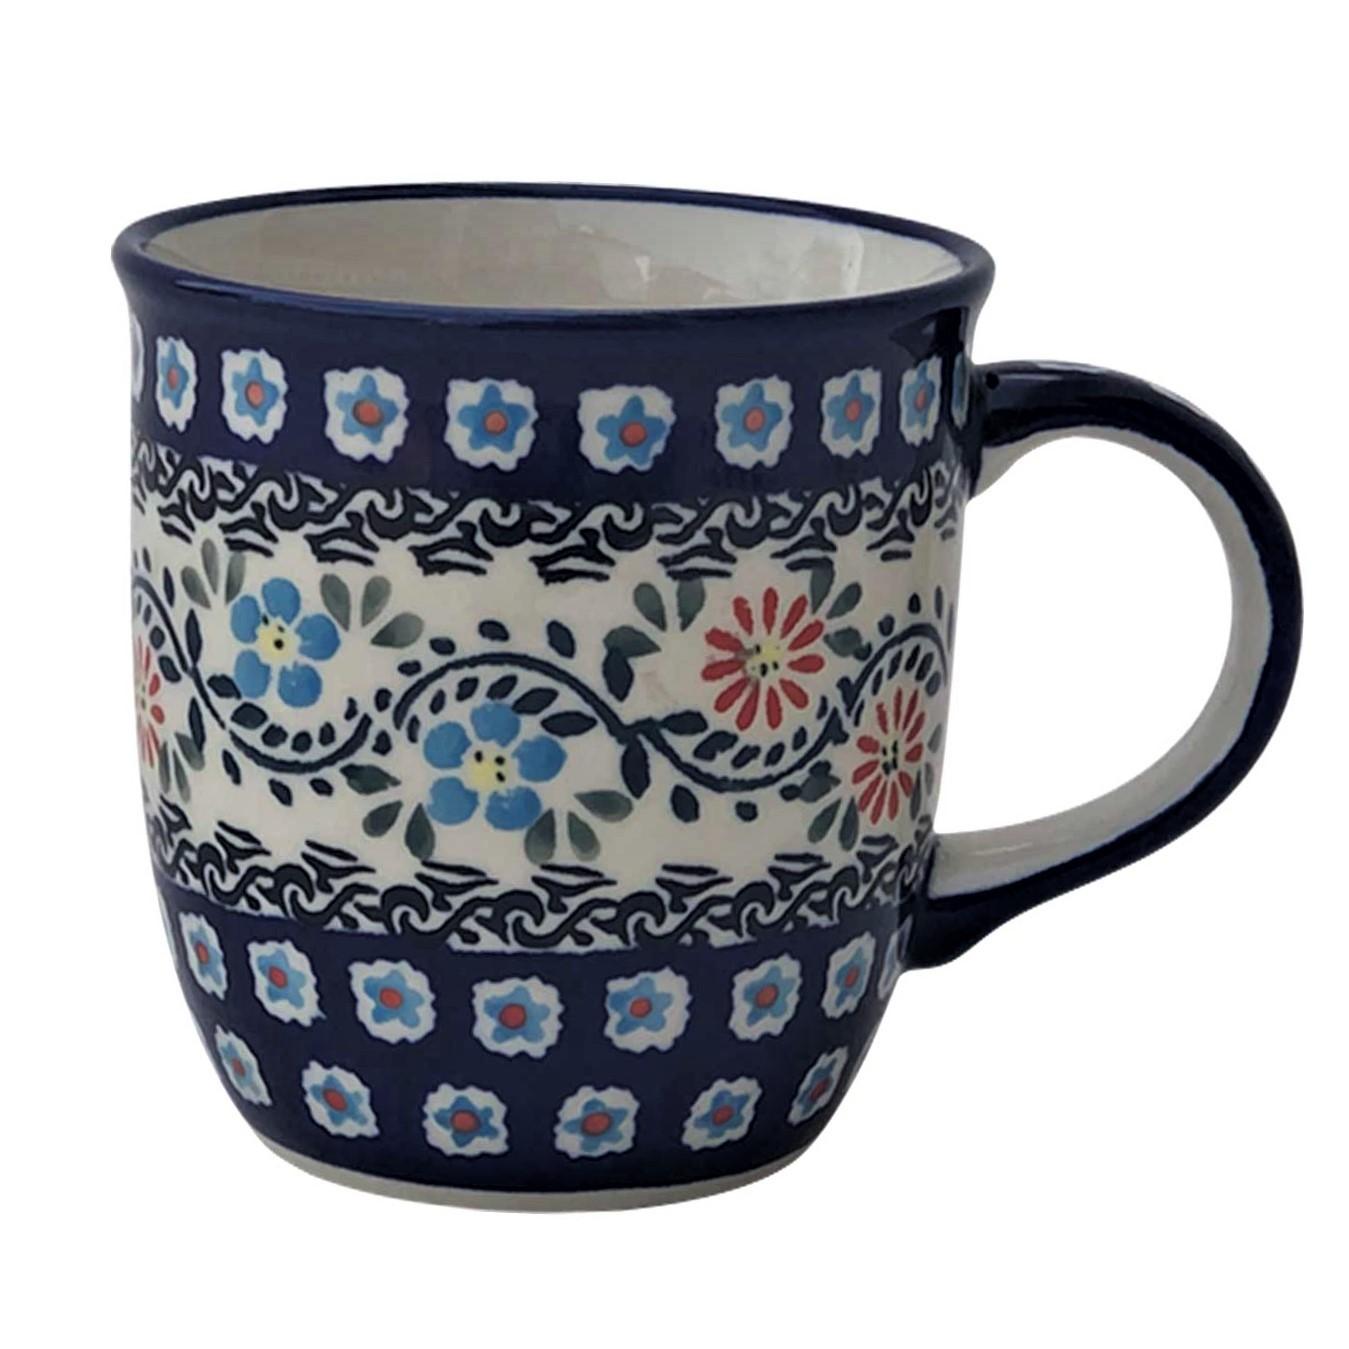 Pottery Avenue 12oz Stoneware Mug - 1105-1145A Heritage Home